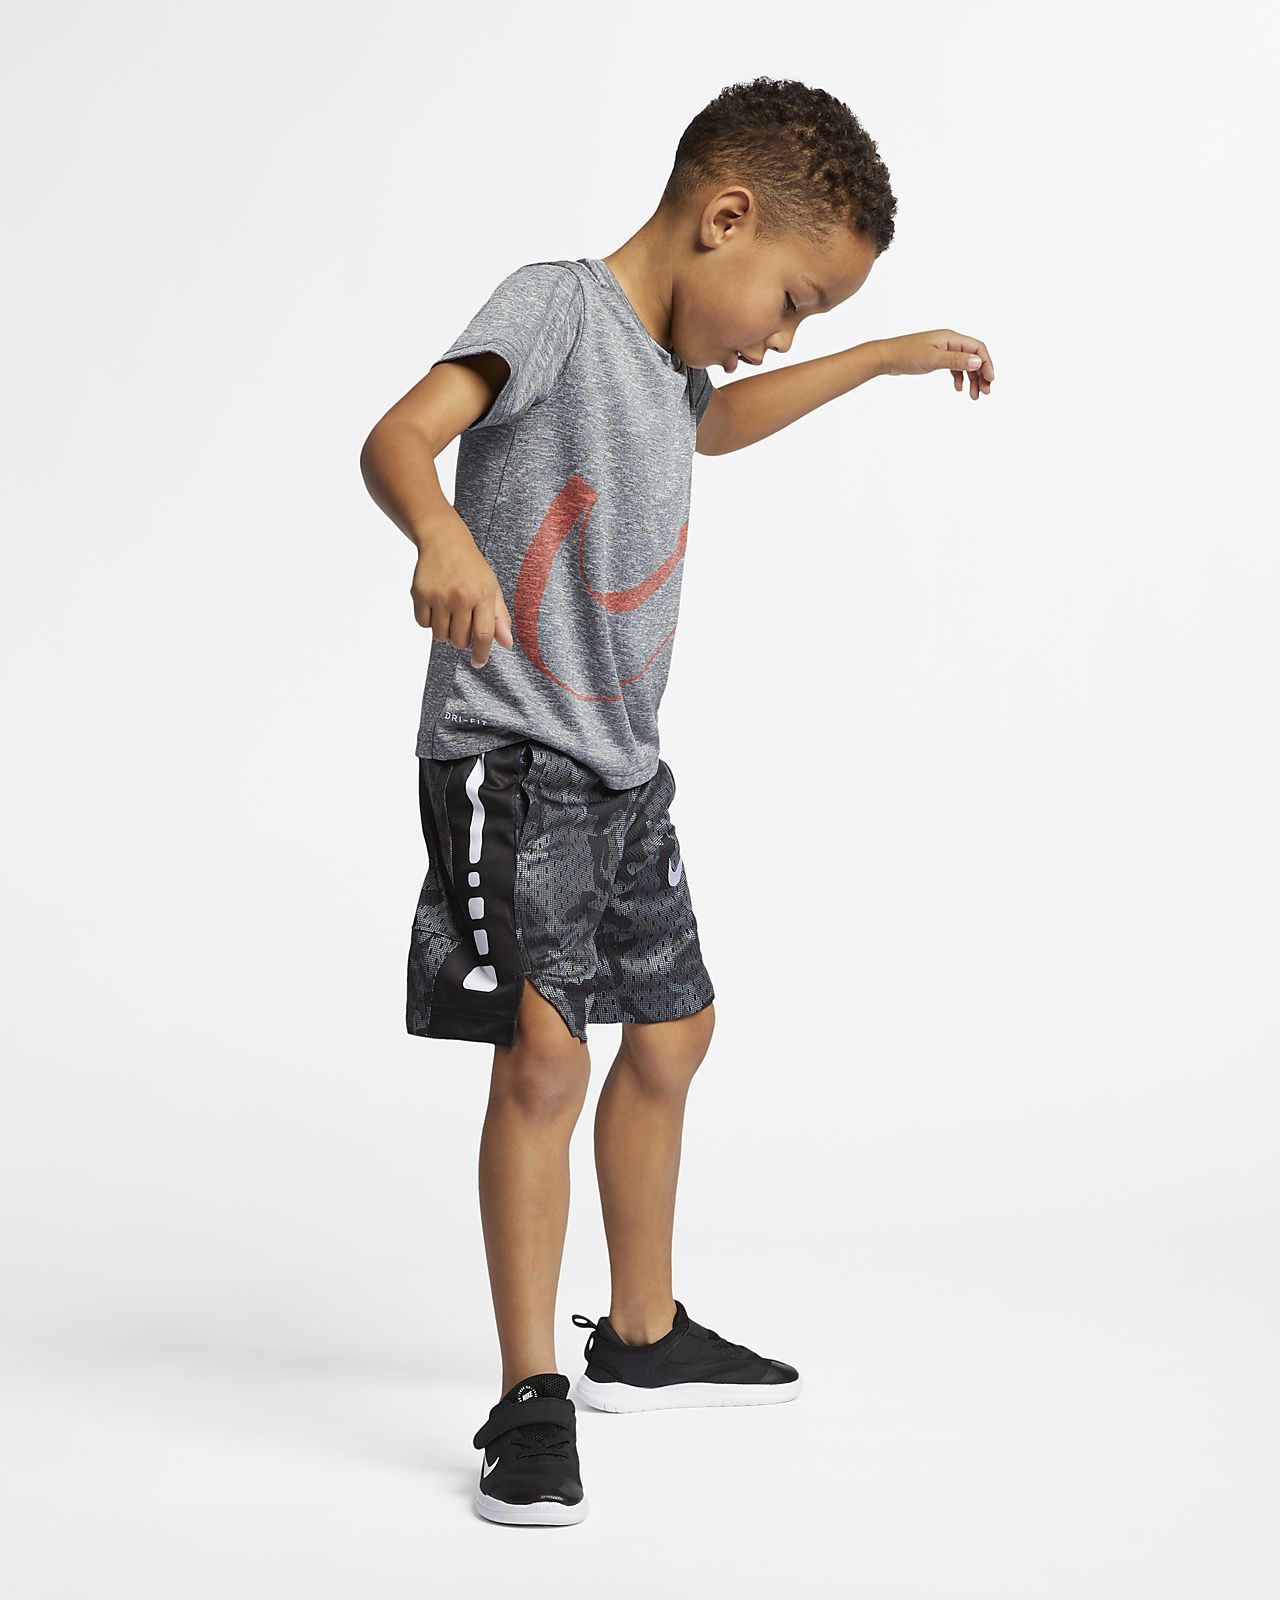 63e3bab9d57 Nike Elite Shorts And Shirts